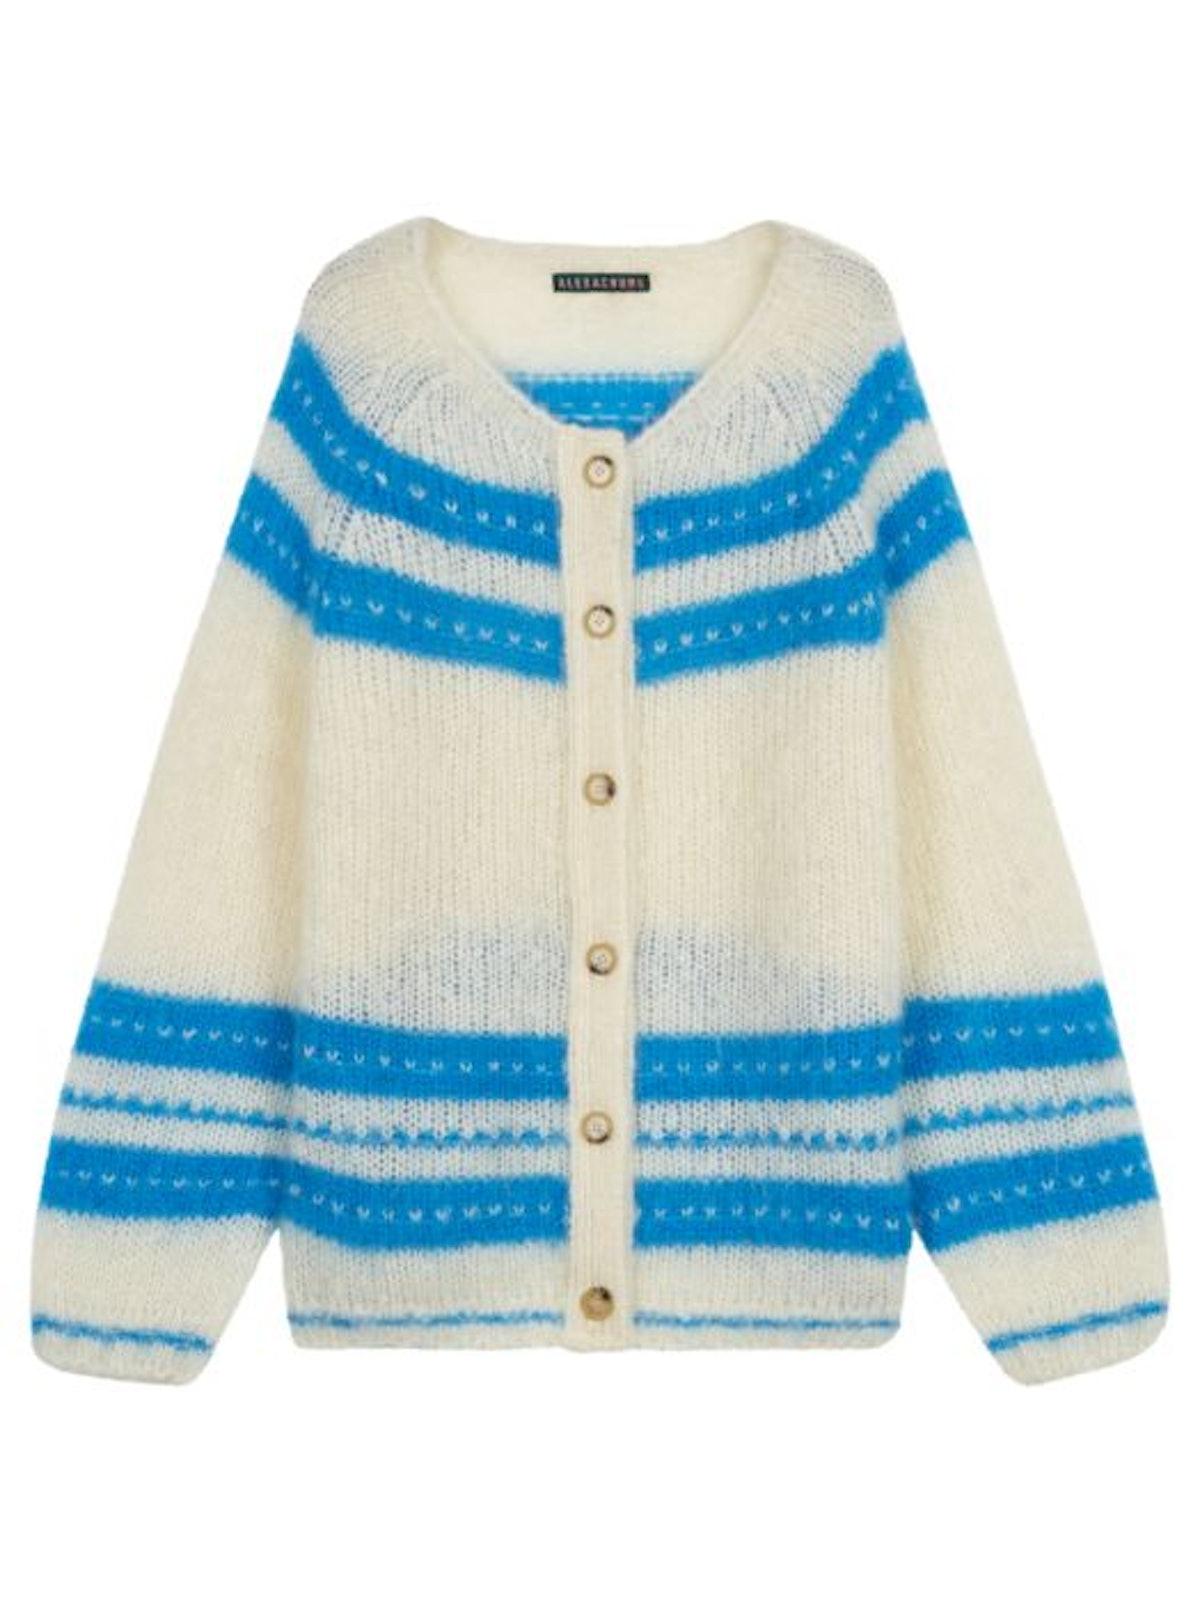 White & Blue Striped Cardigan